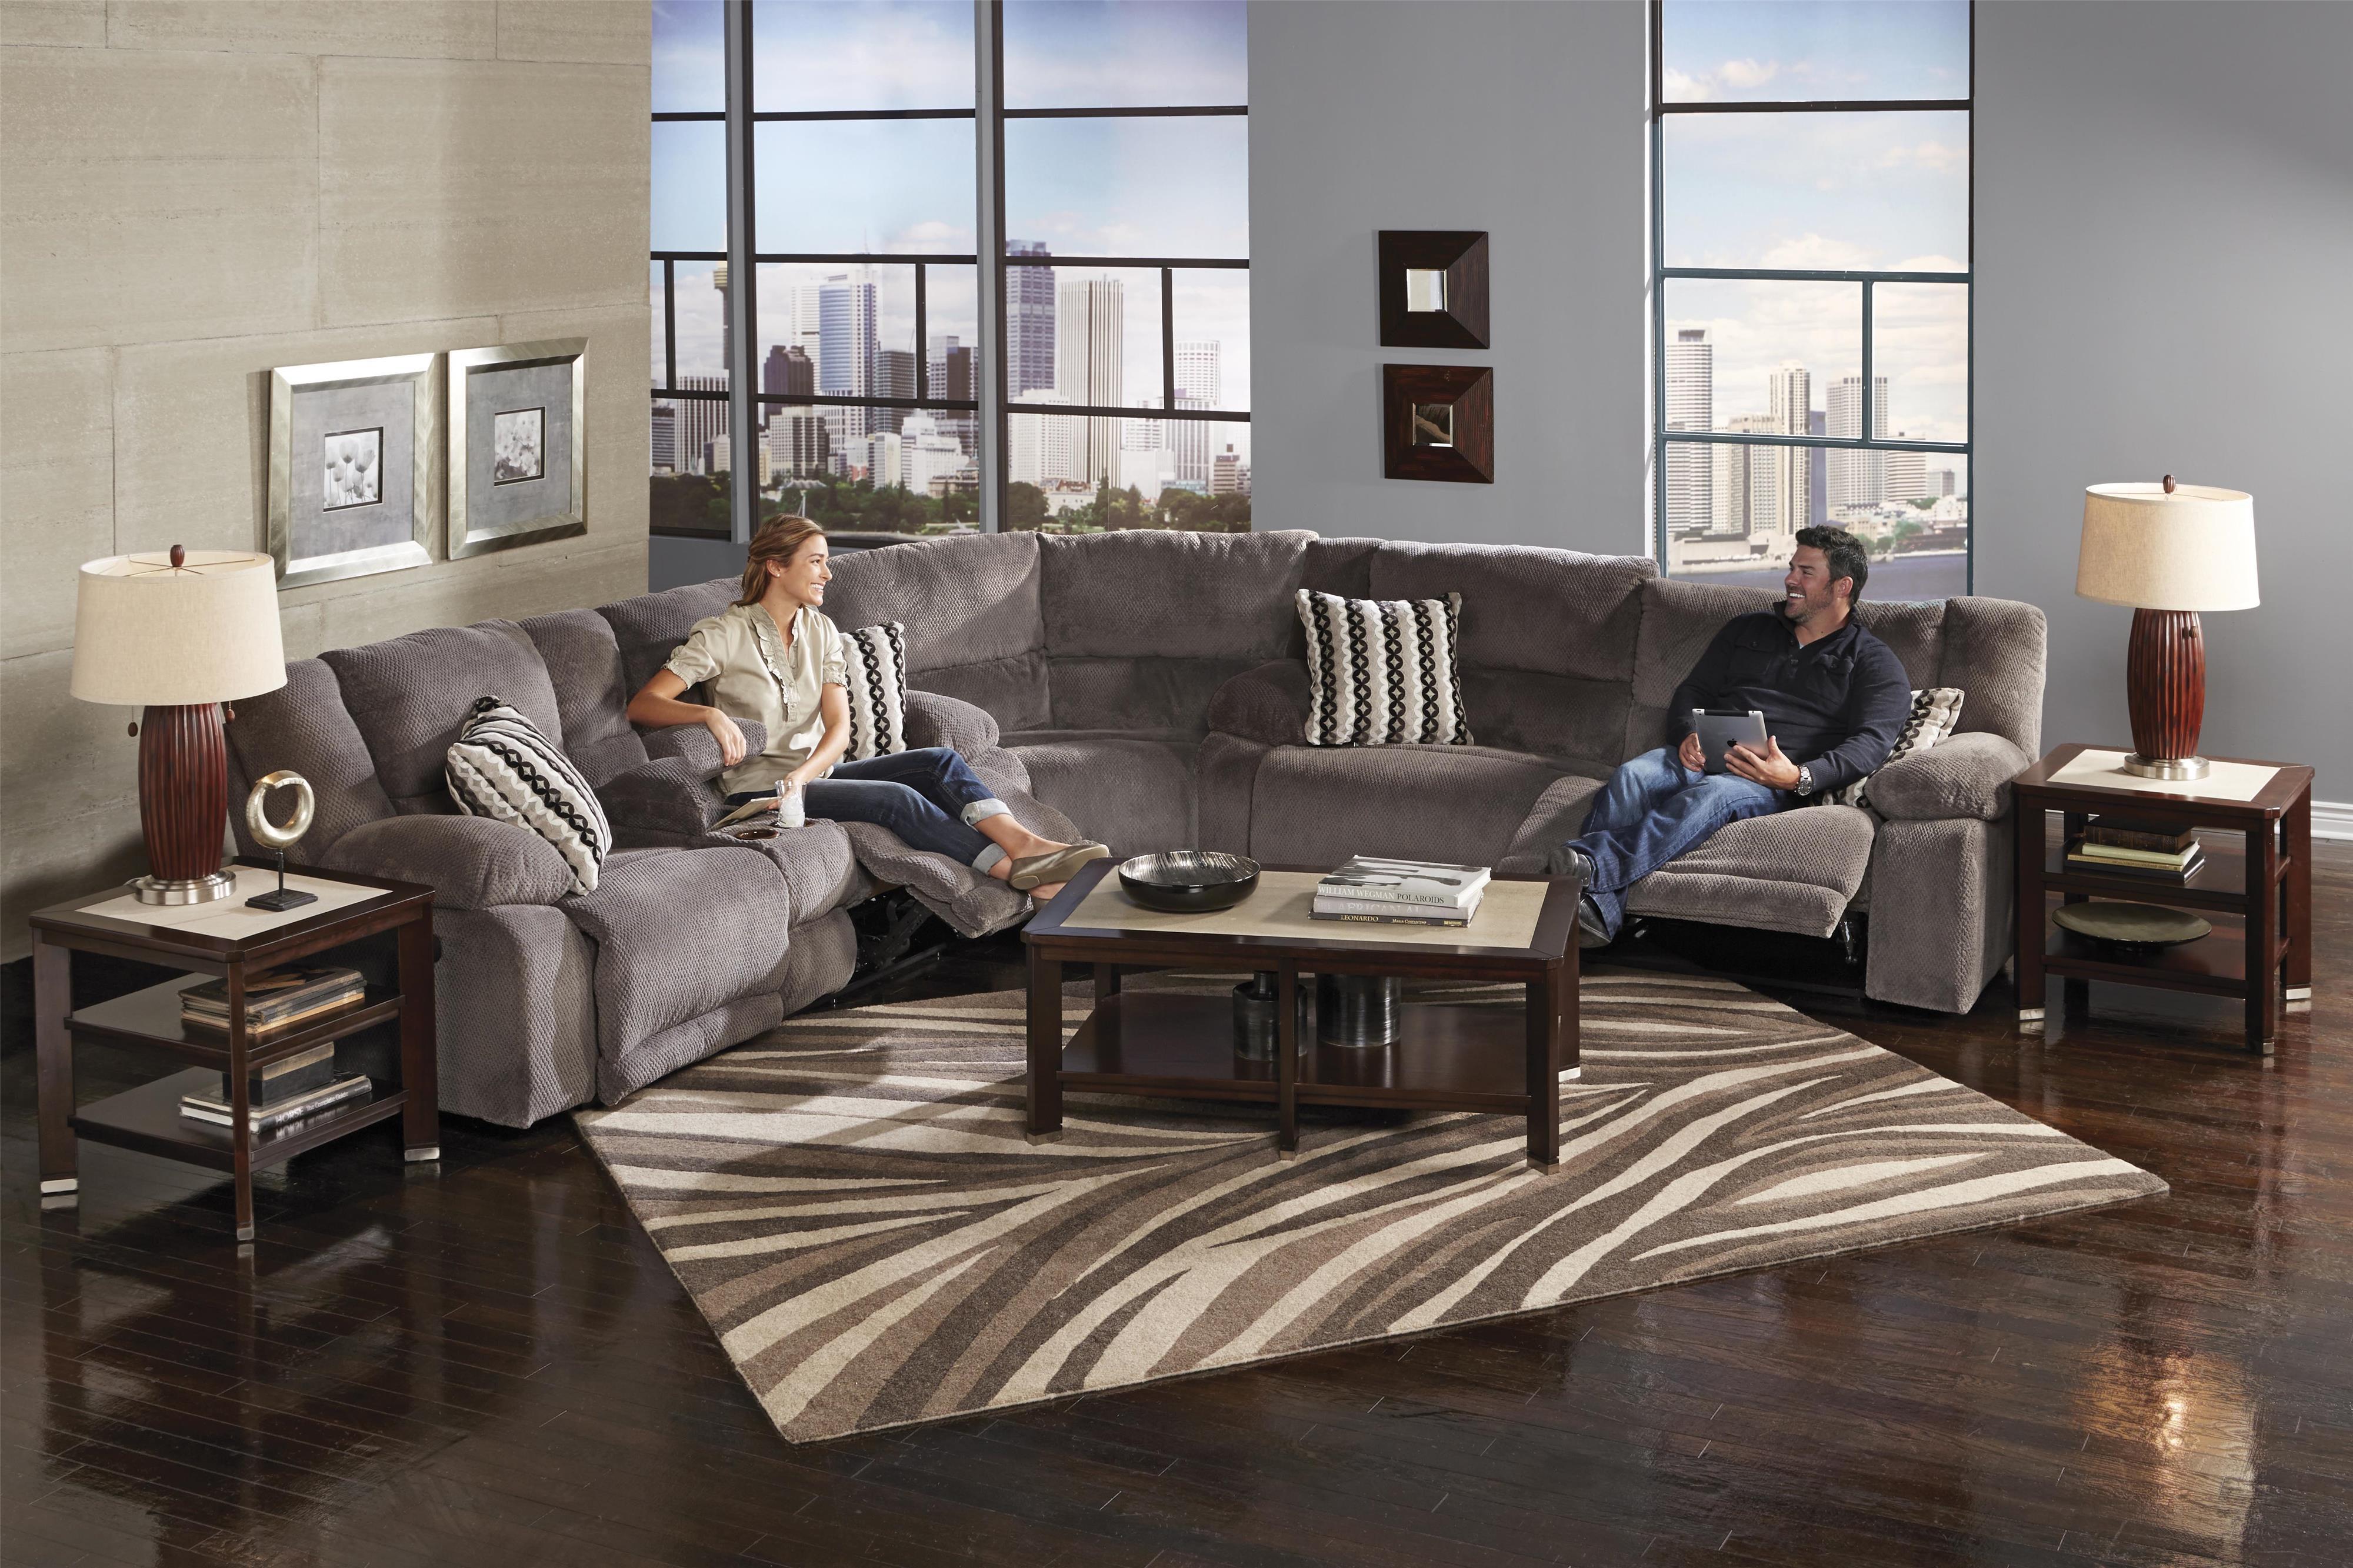 Catnapper Hammond Reclining Sectional Sofa - Item Number: 1441-2776-58+1448+1449